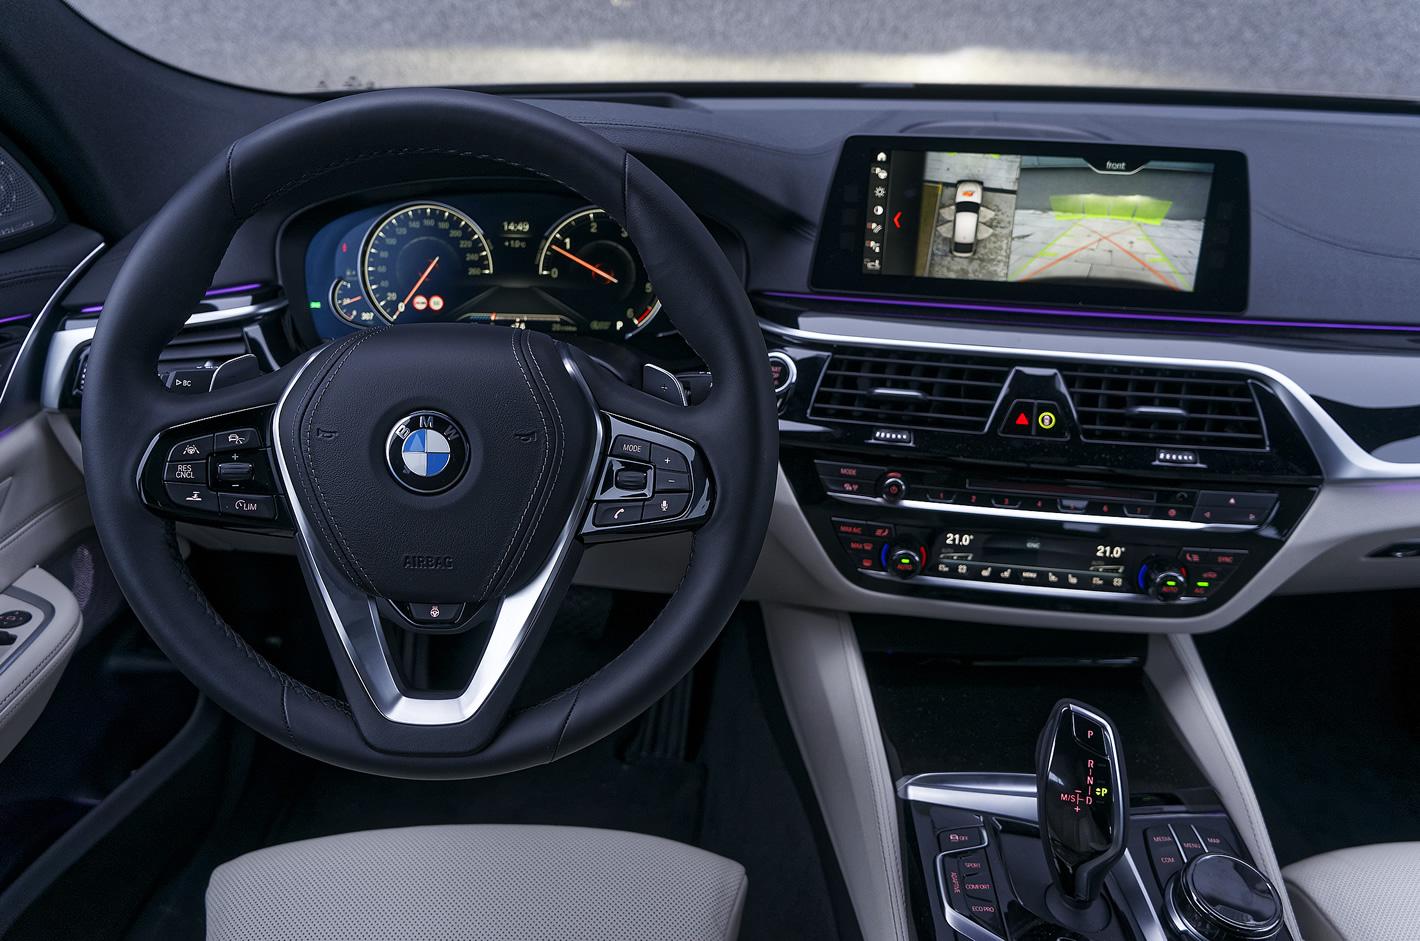 BMW Serii 6 Gran Turismo - zaawansowany system iDrive